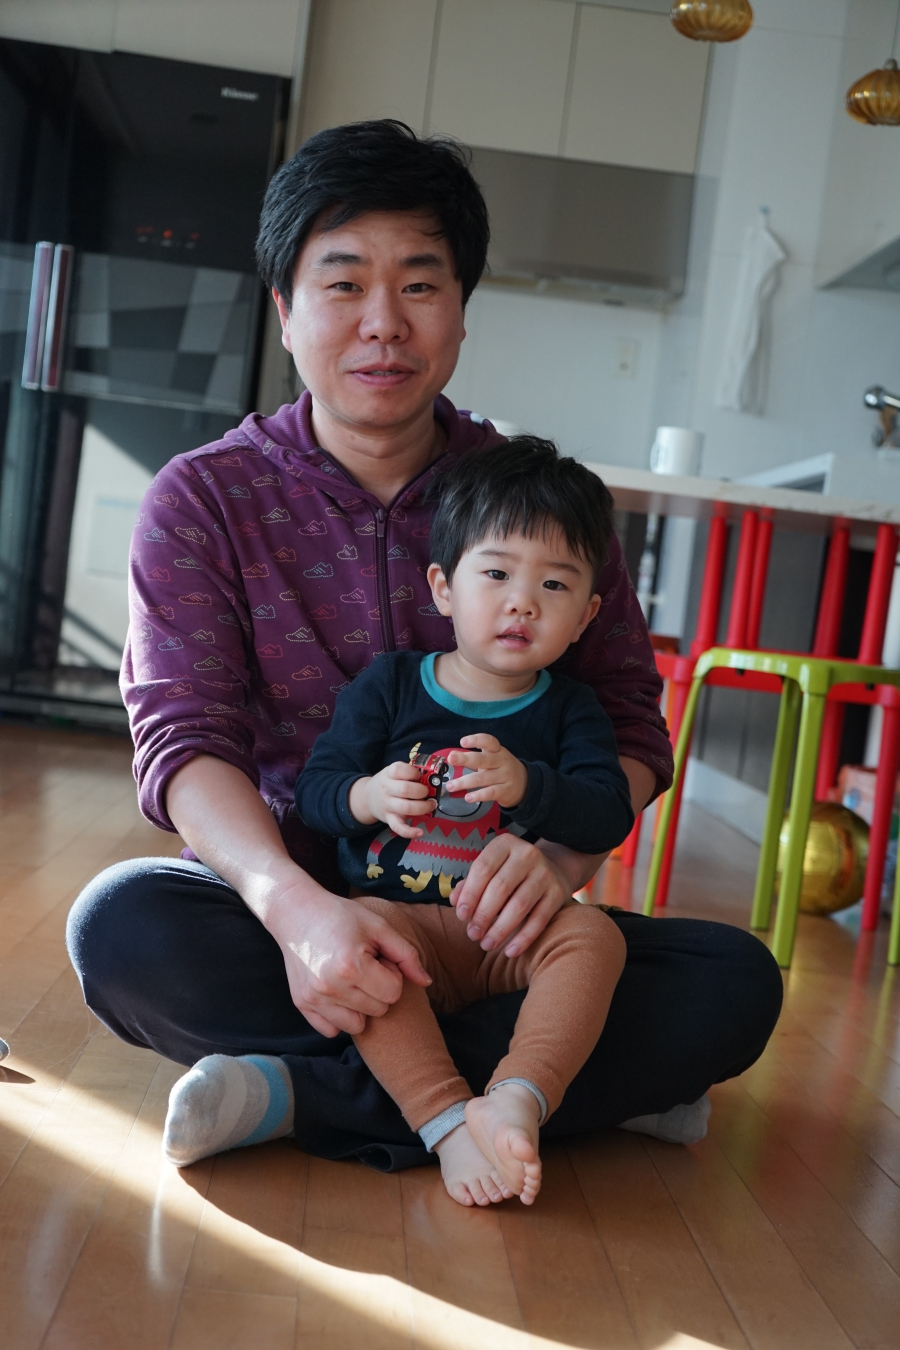 Wonhoe Bae and his son.